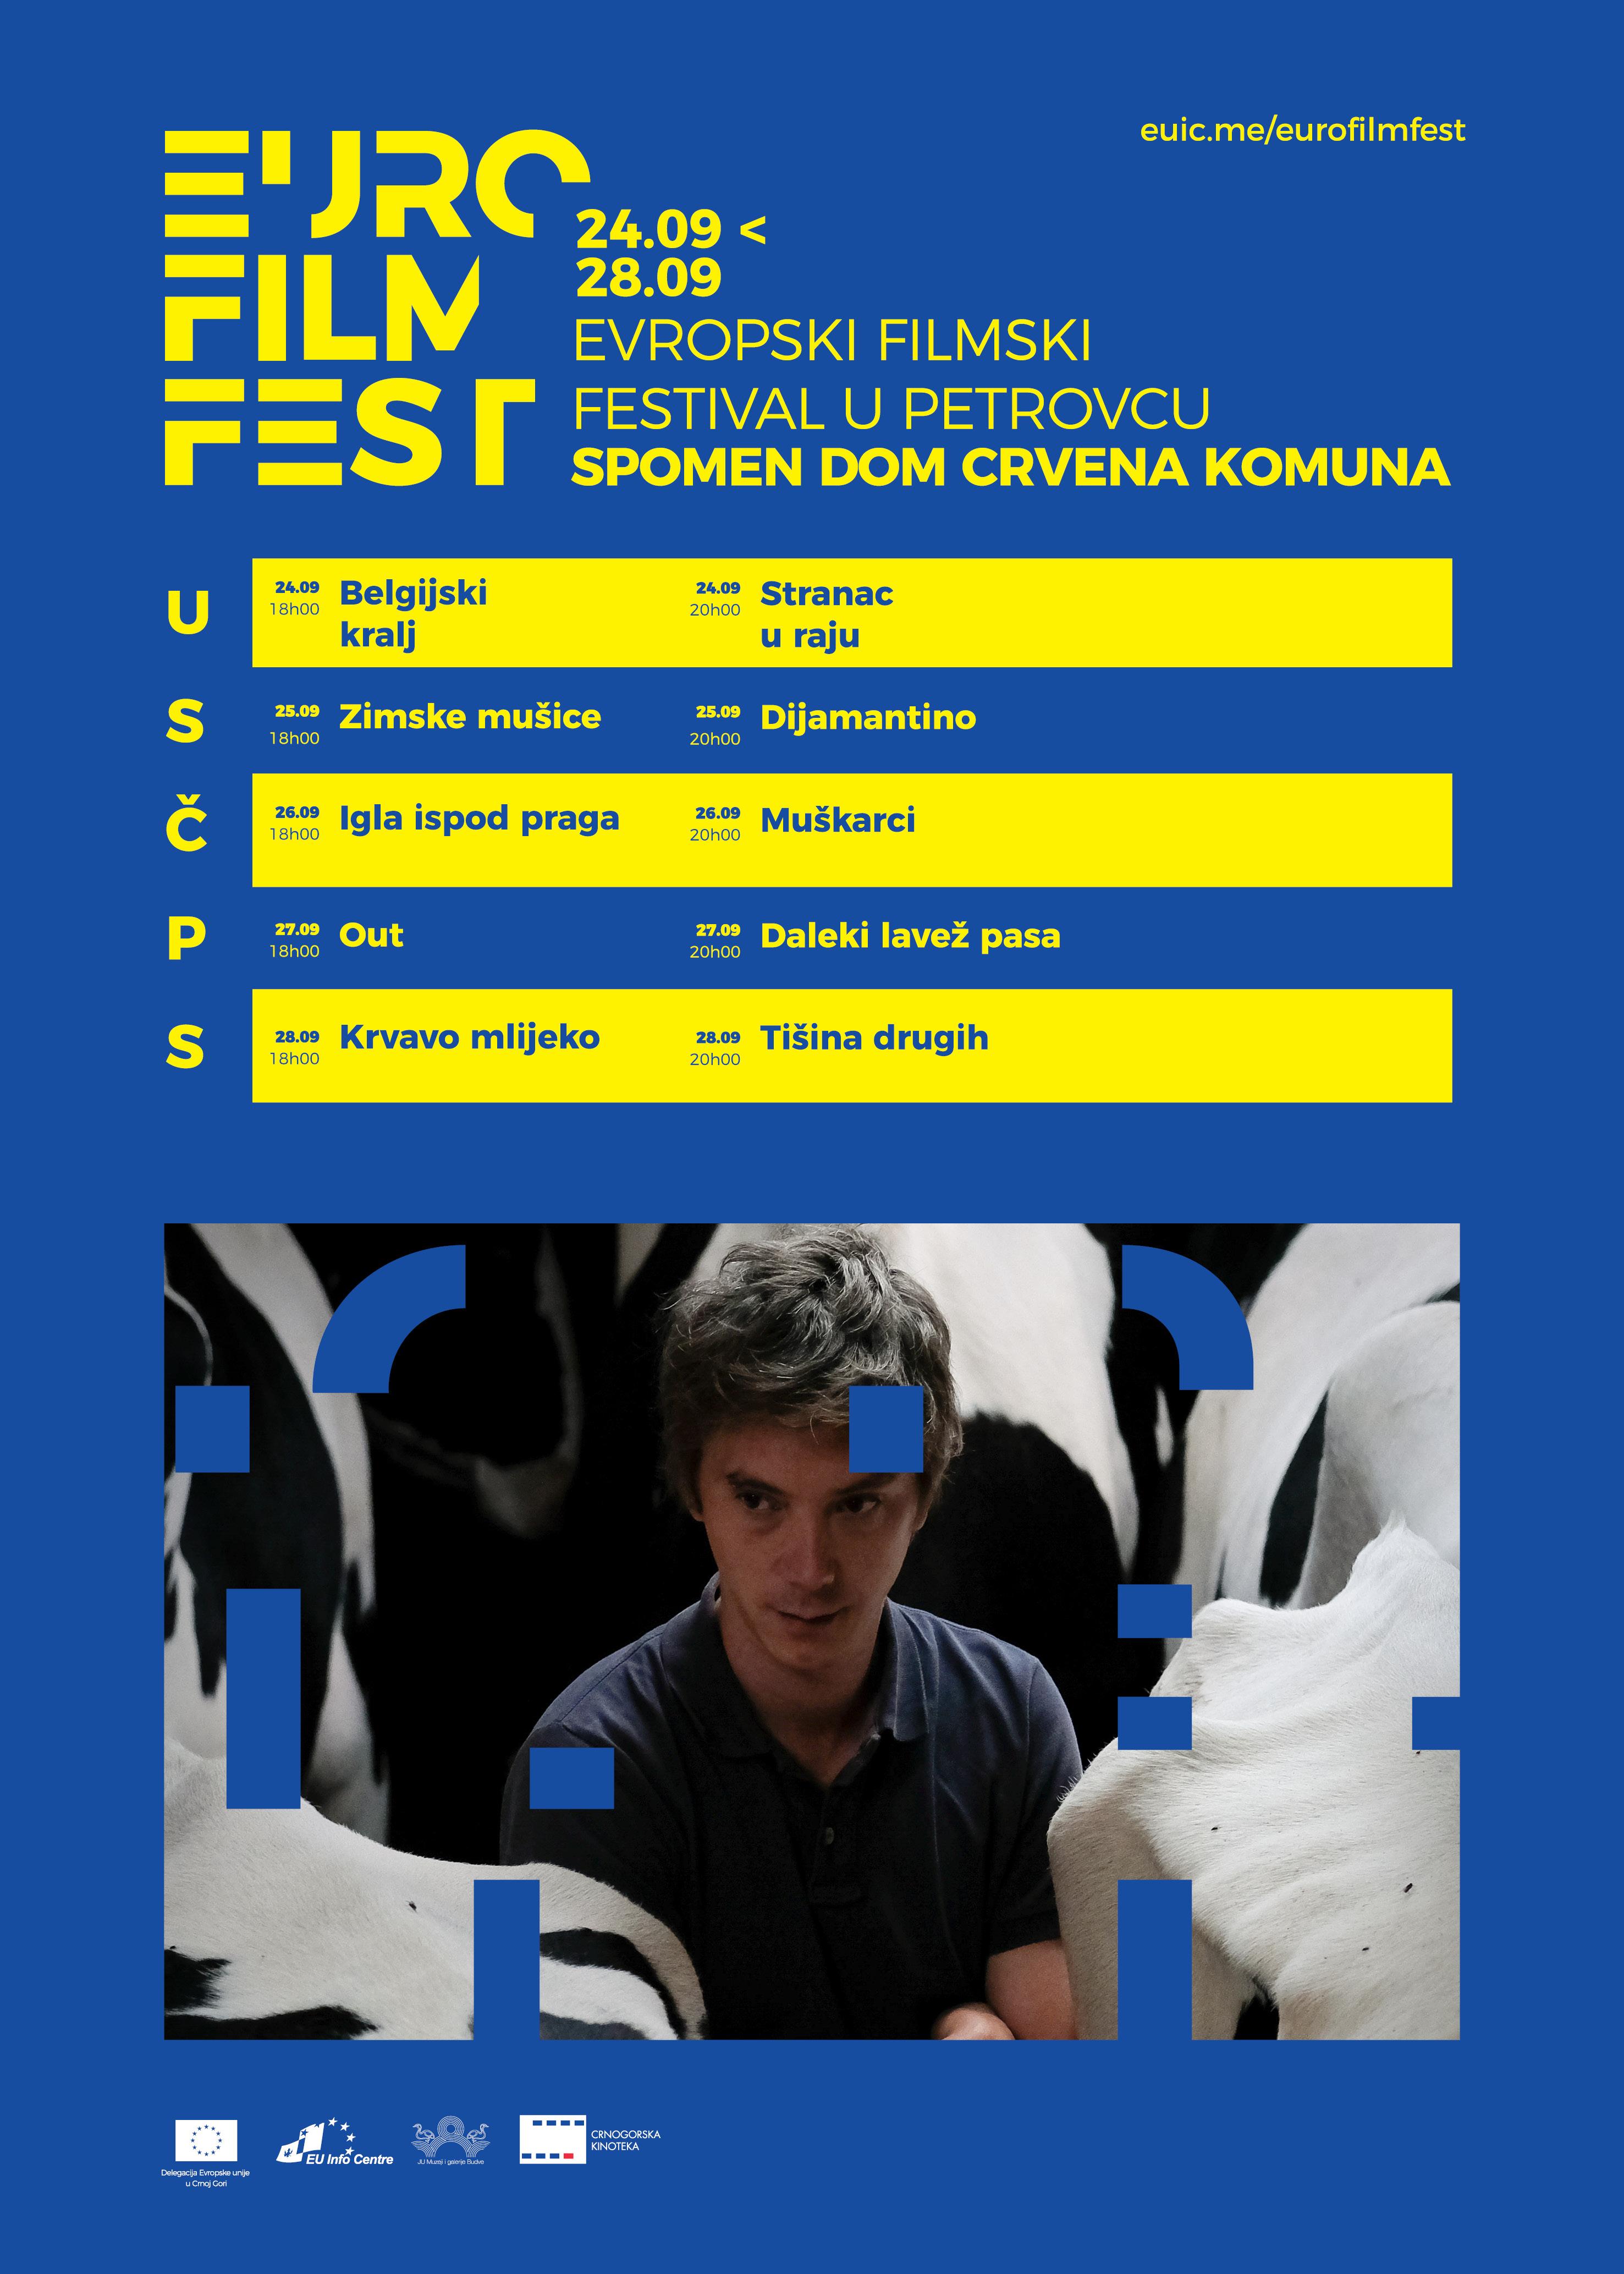 plakat Evropski filmski festival 2019 Petrovac